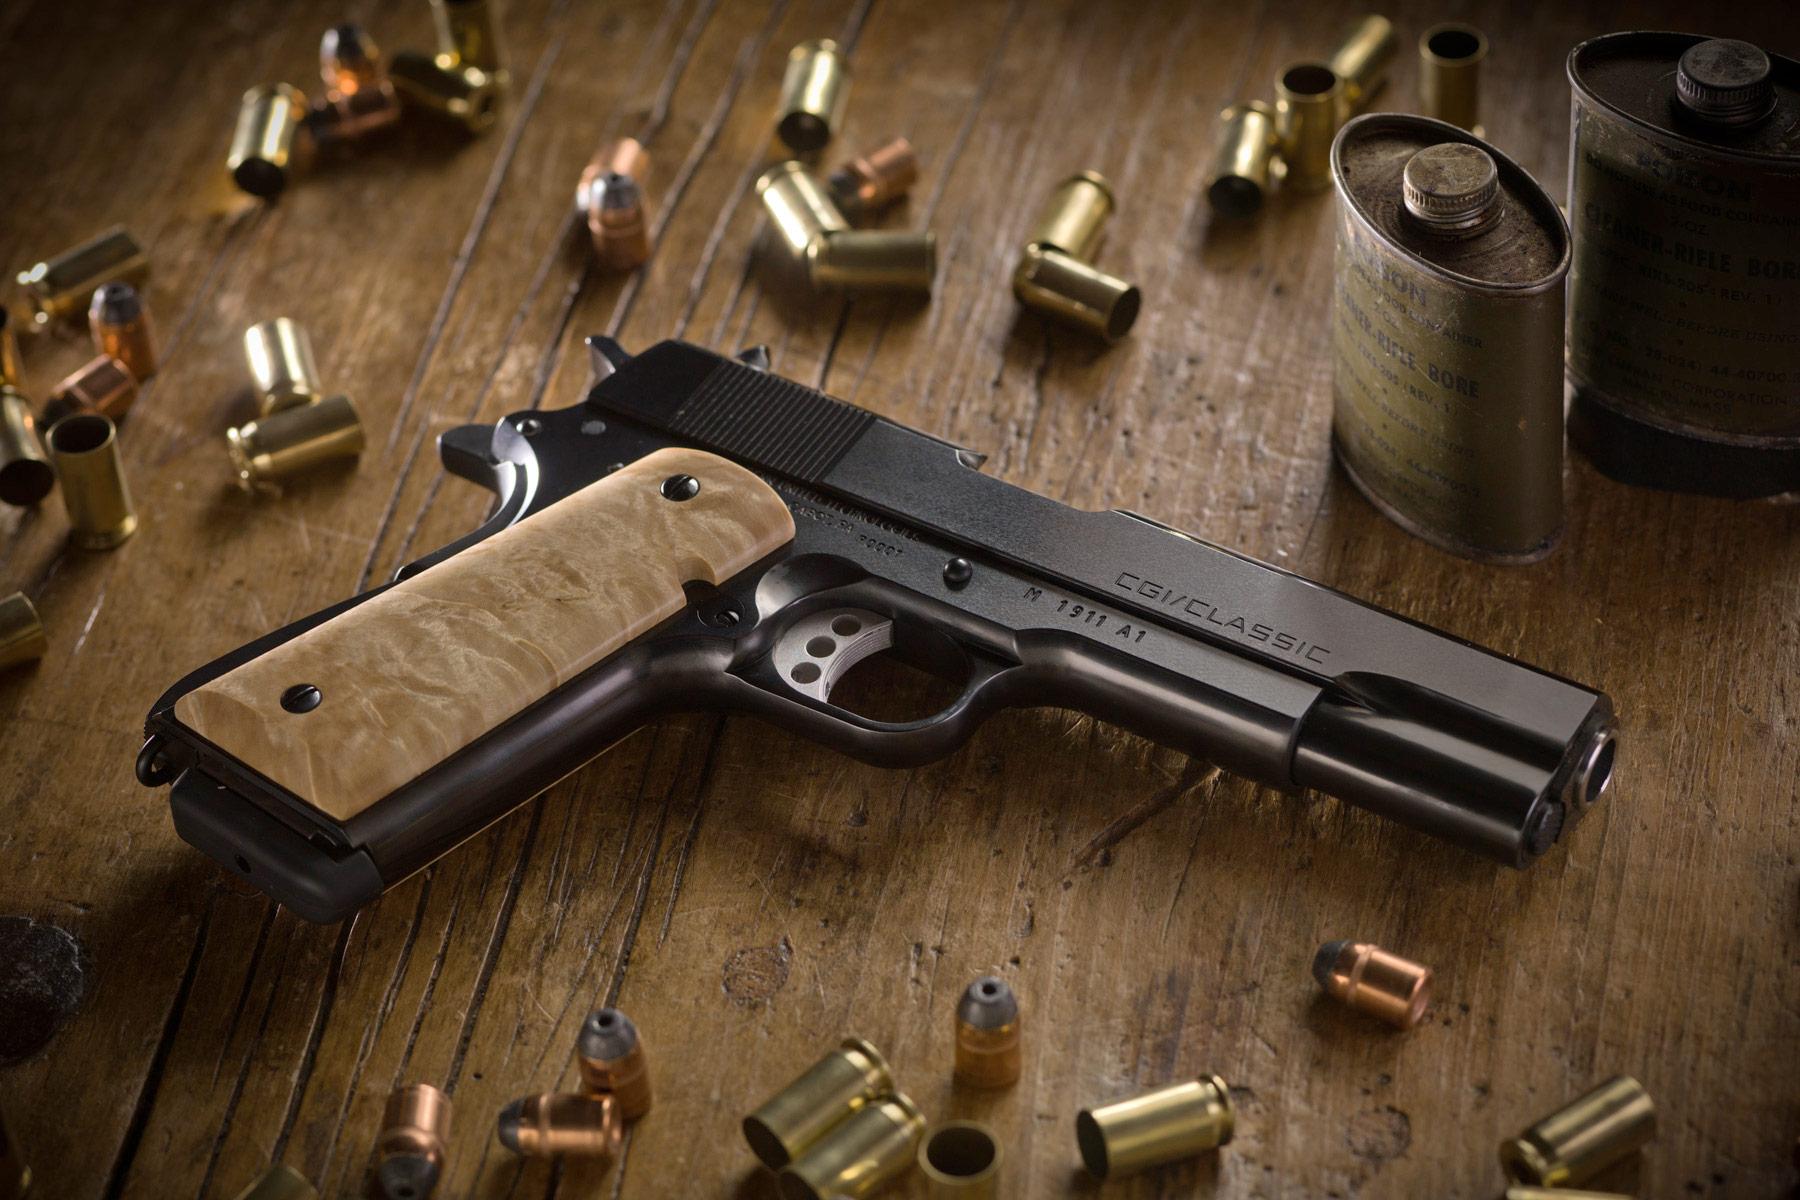 1911 pistol background wallpaper hd wallpapers cgi classic 1911 pistol 1800x1200